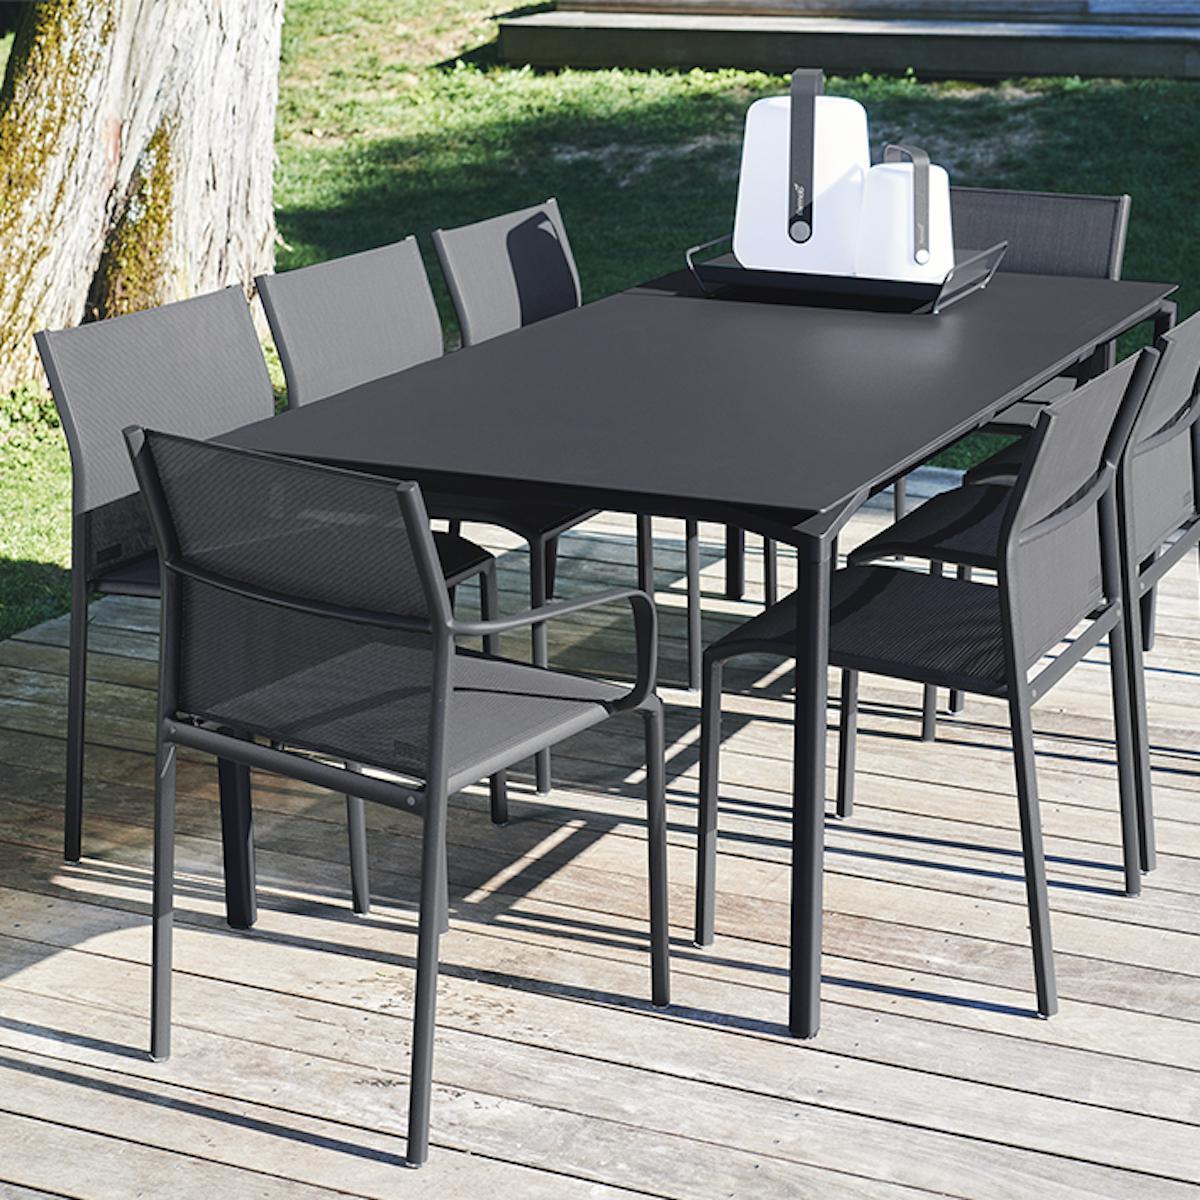 Table 95x195cm CALVI Fermob vert opaline